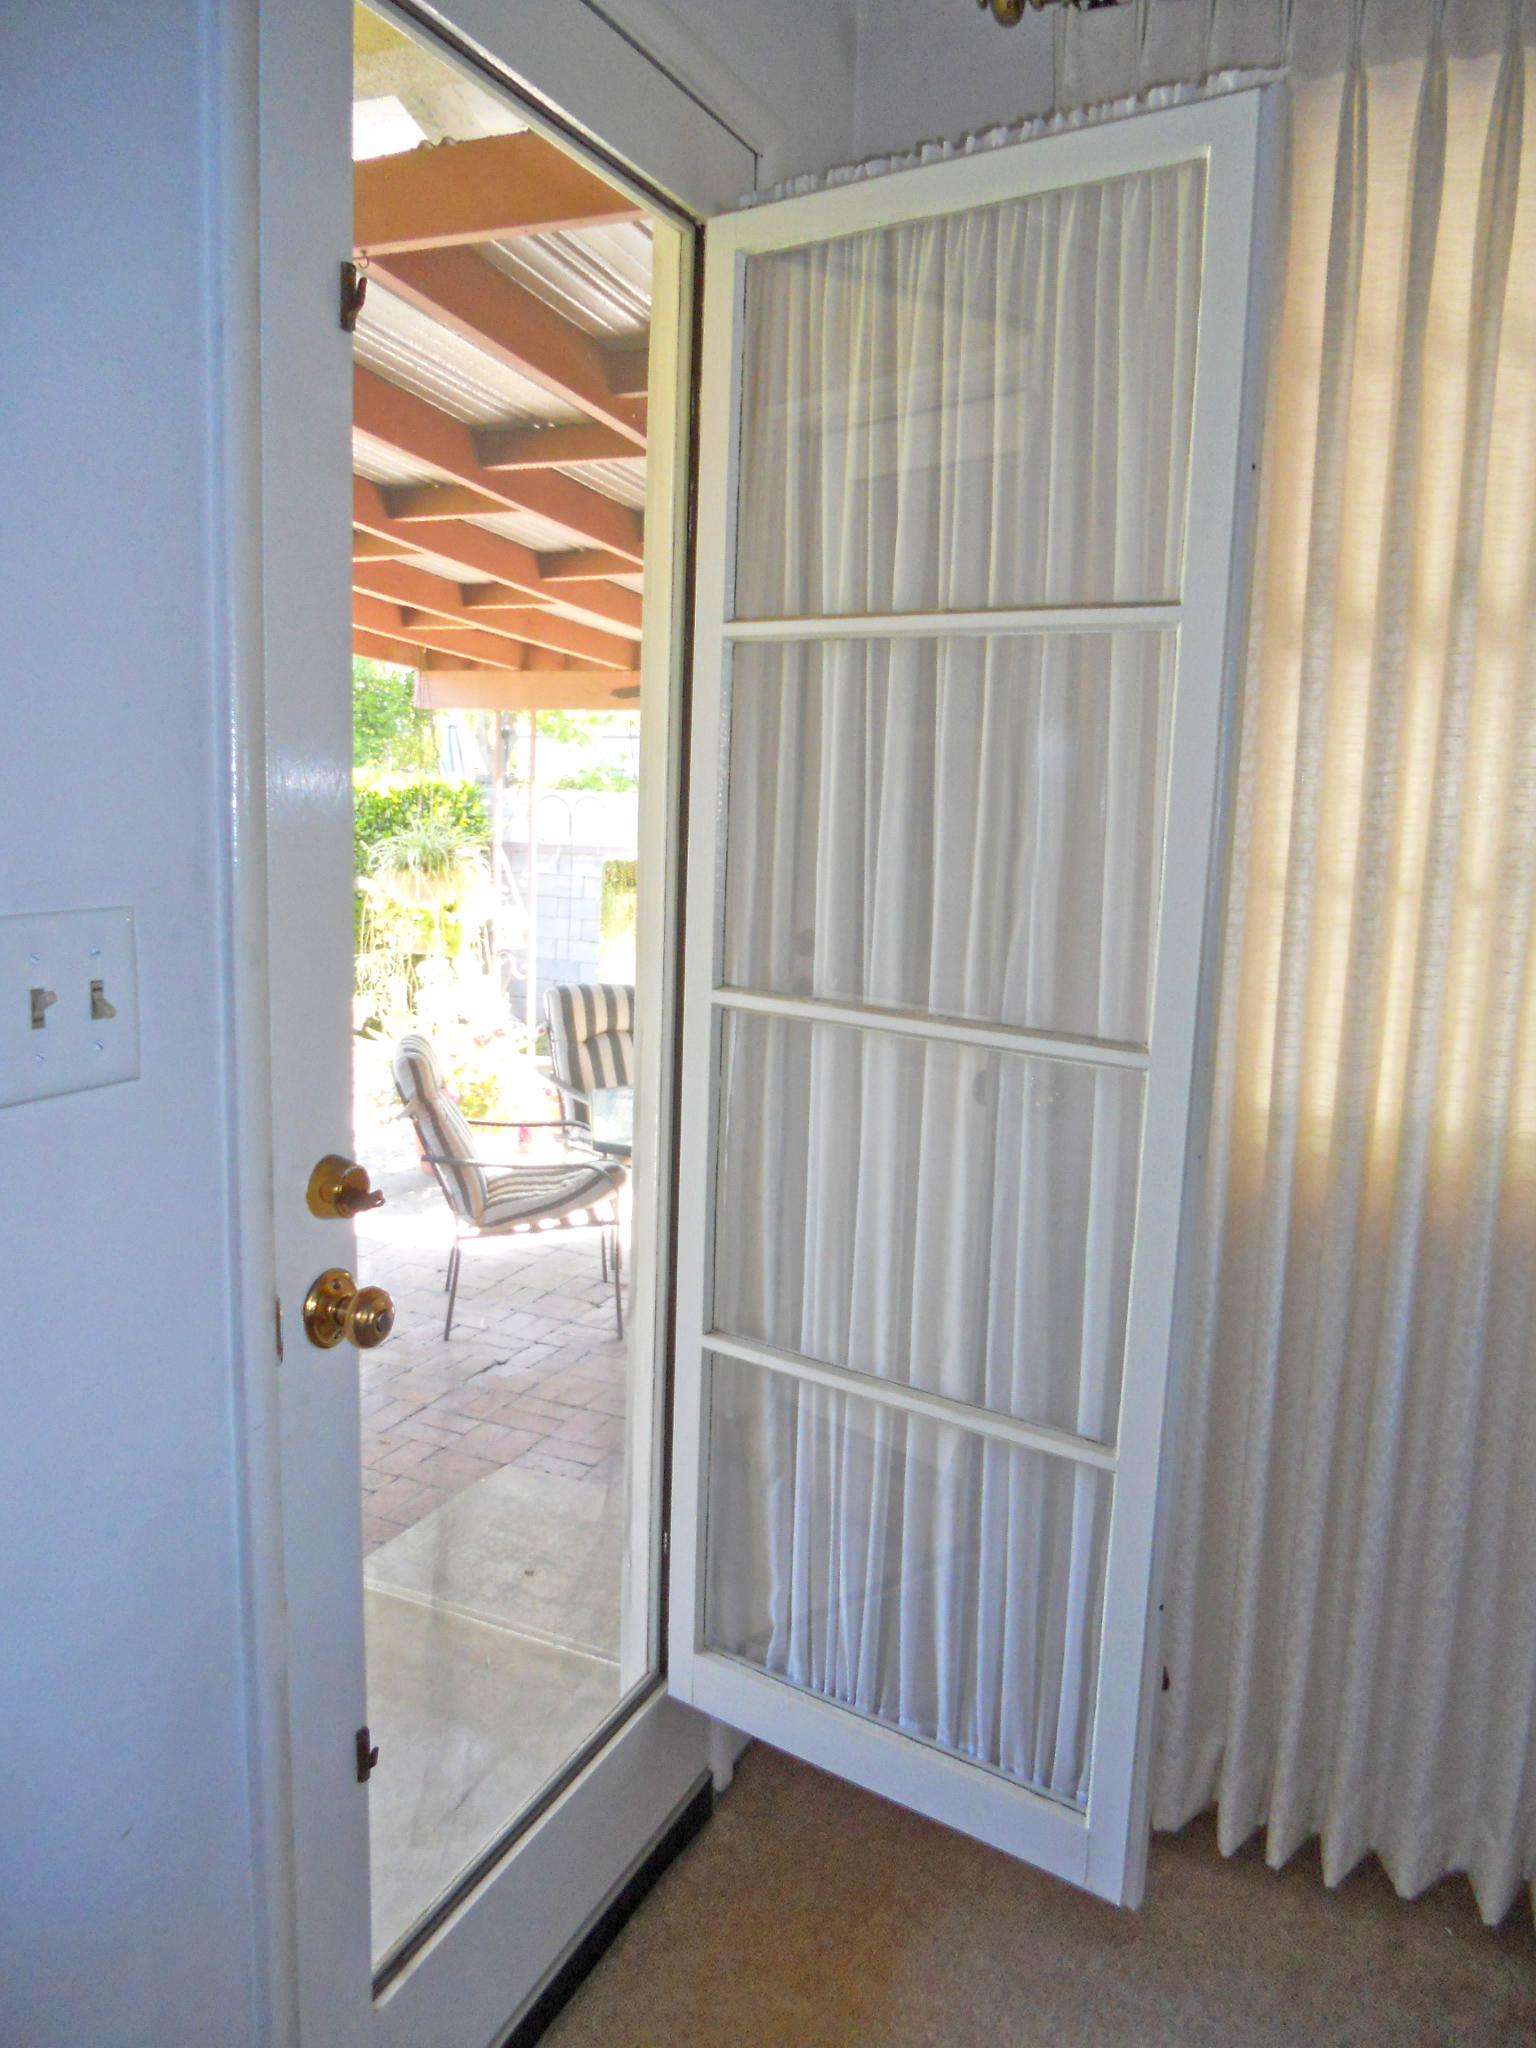 A favorite mid-century door feature -- unlatch the glass paneled door to reveal a screen!